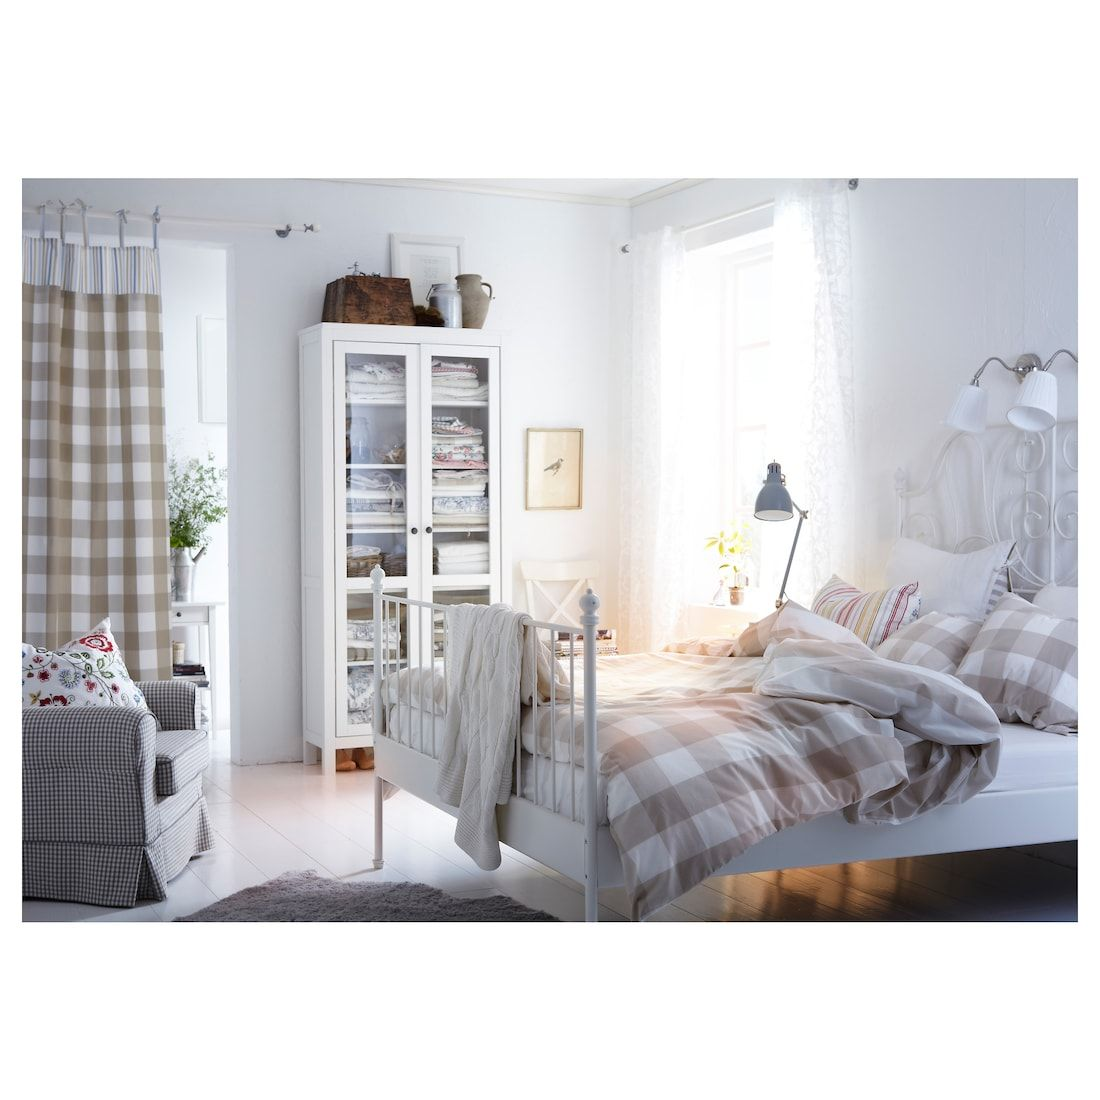 Leirvik Estructura Cama Blanco 140x200 Cm Ikea In 2020 Leirvik Bed Bed Frame Home